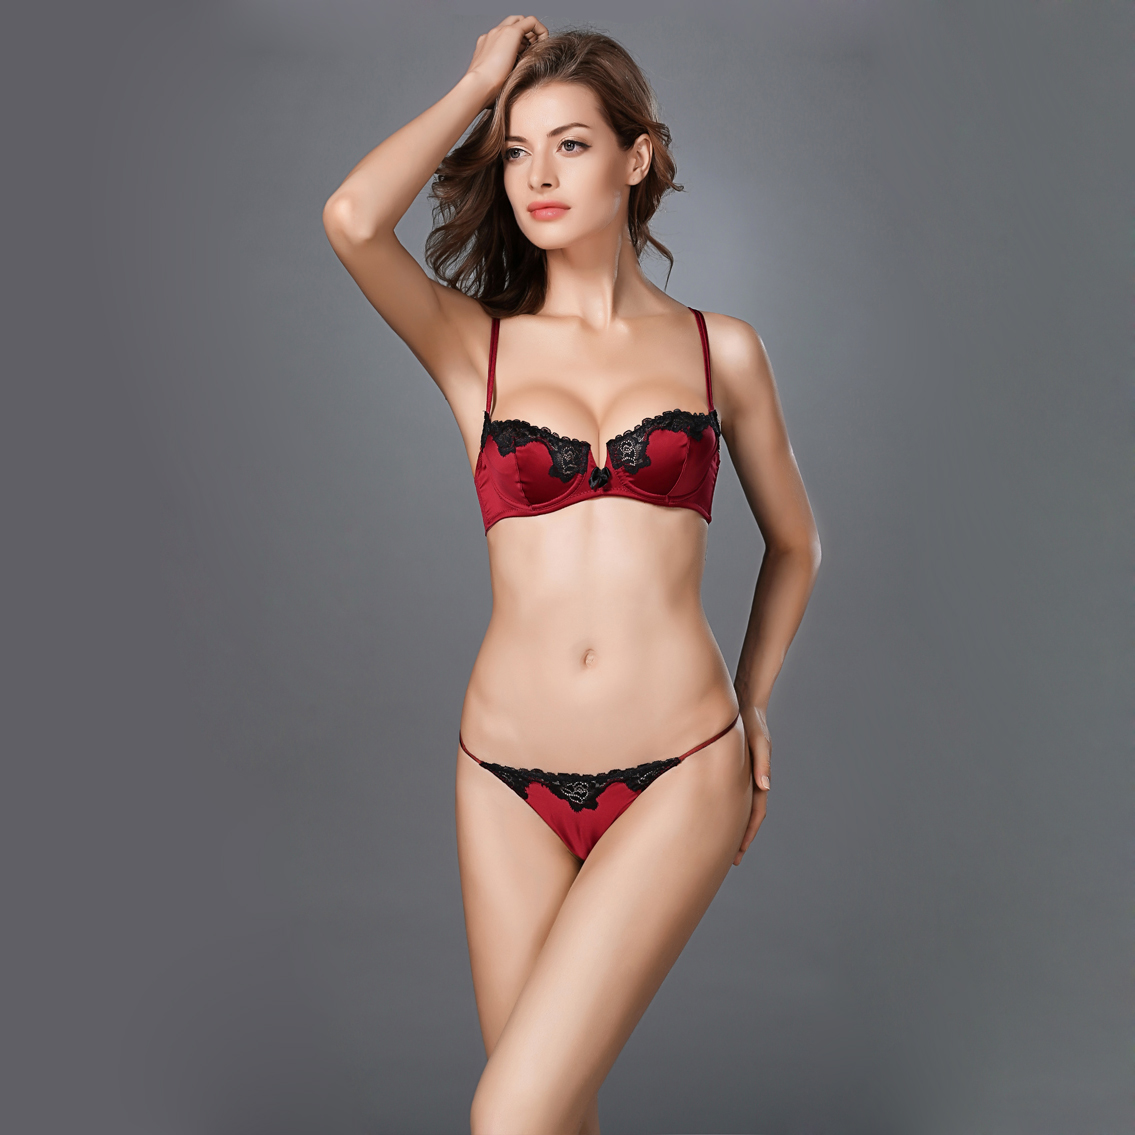 cougar lingerie